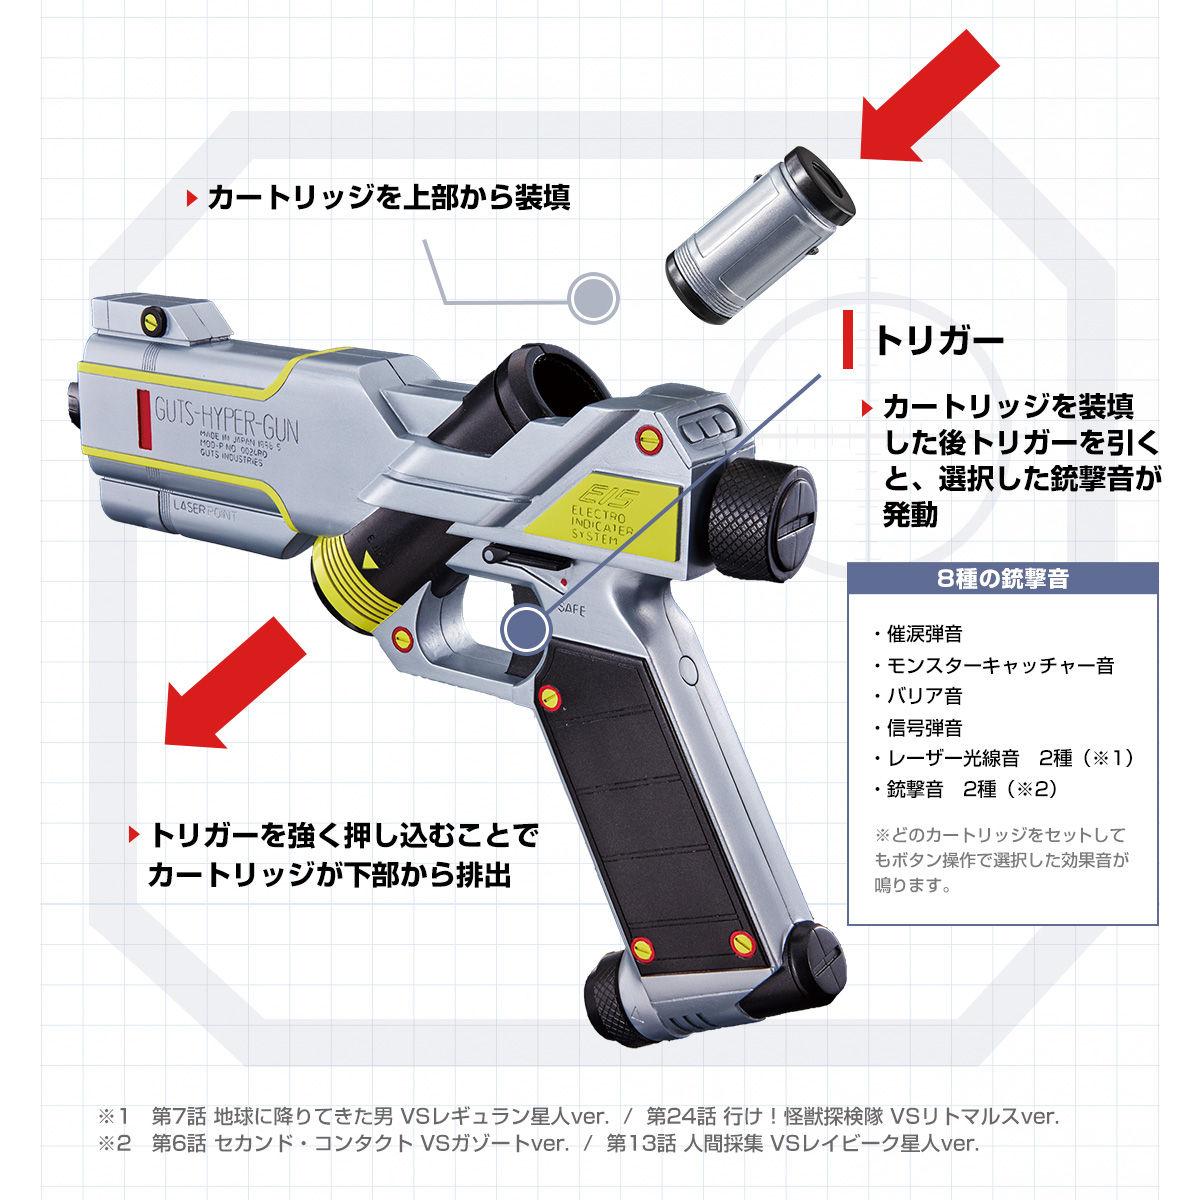 GUTSハイパー トリガー 8つの銃撃音